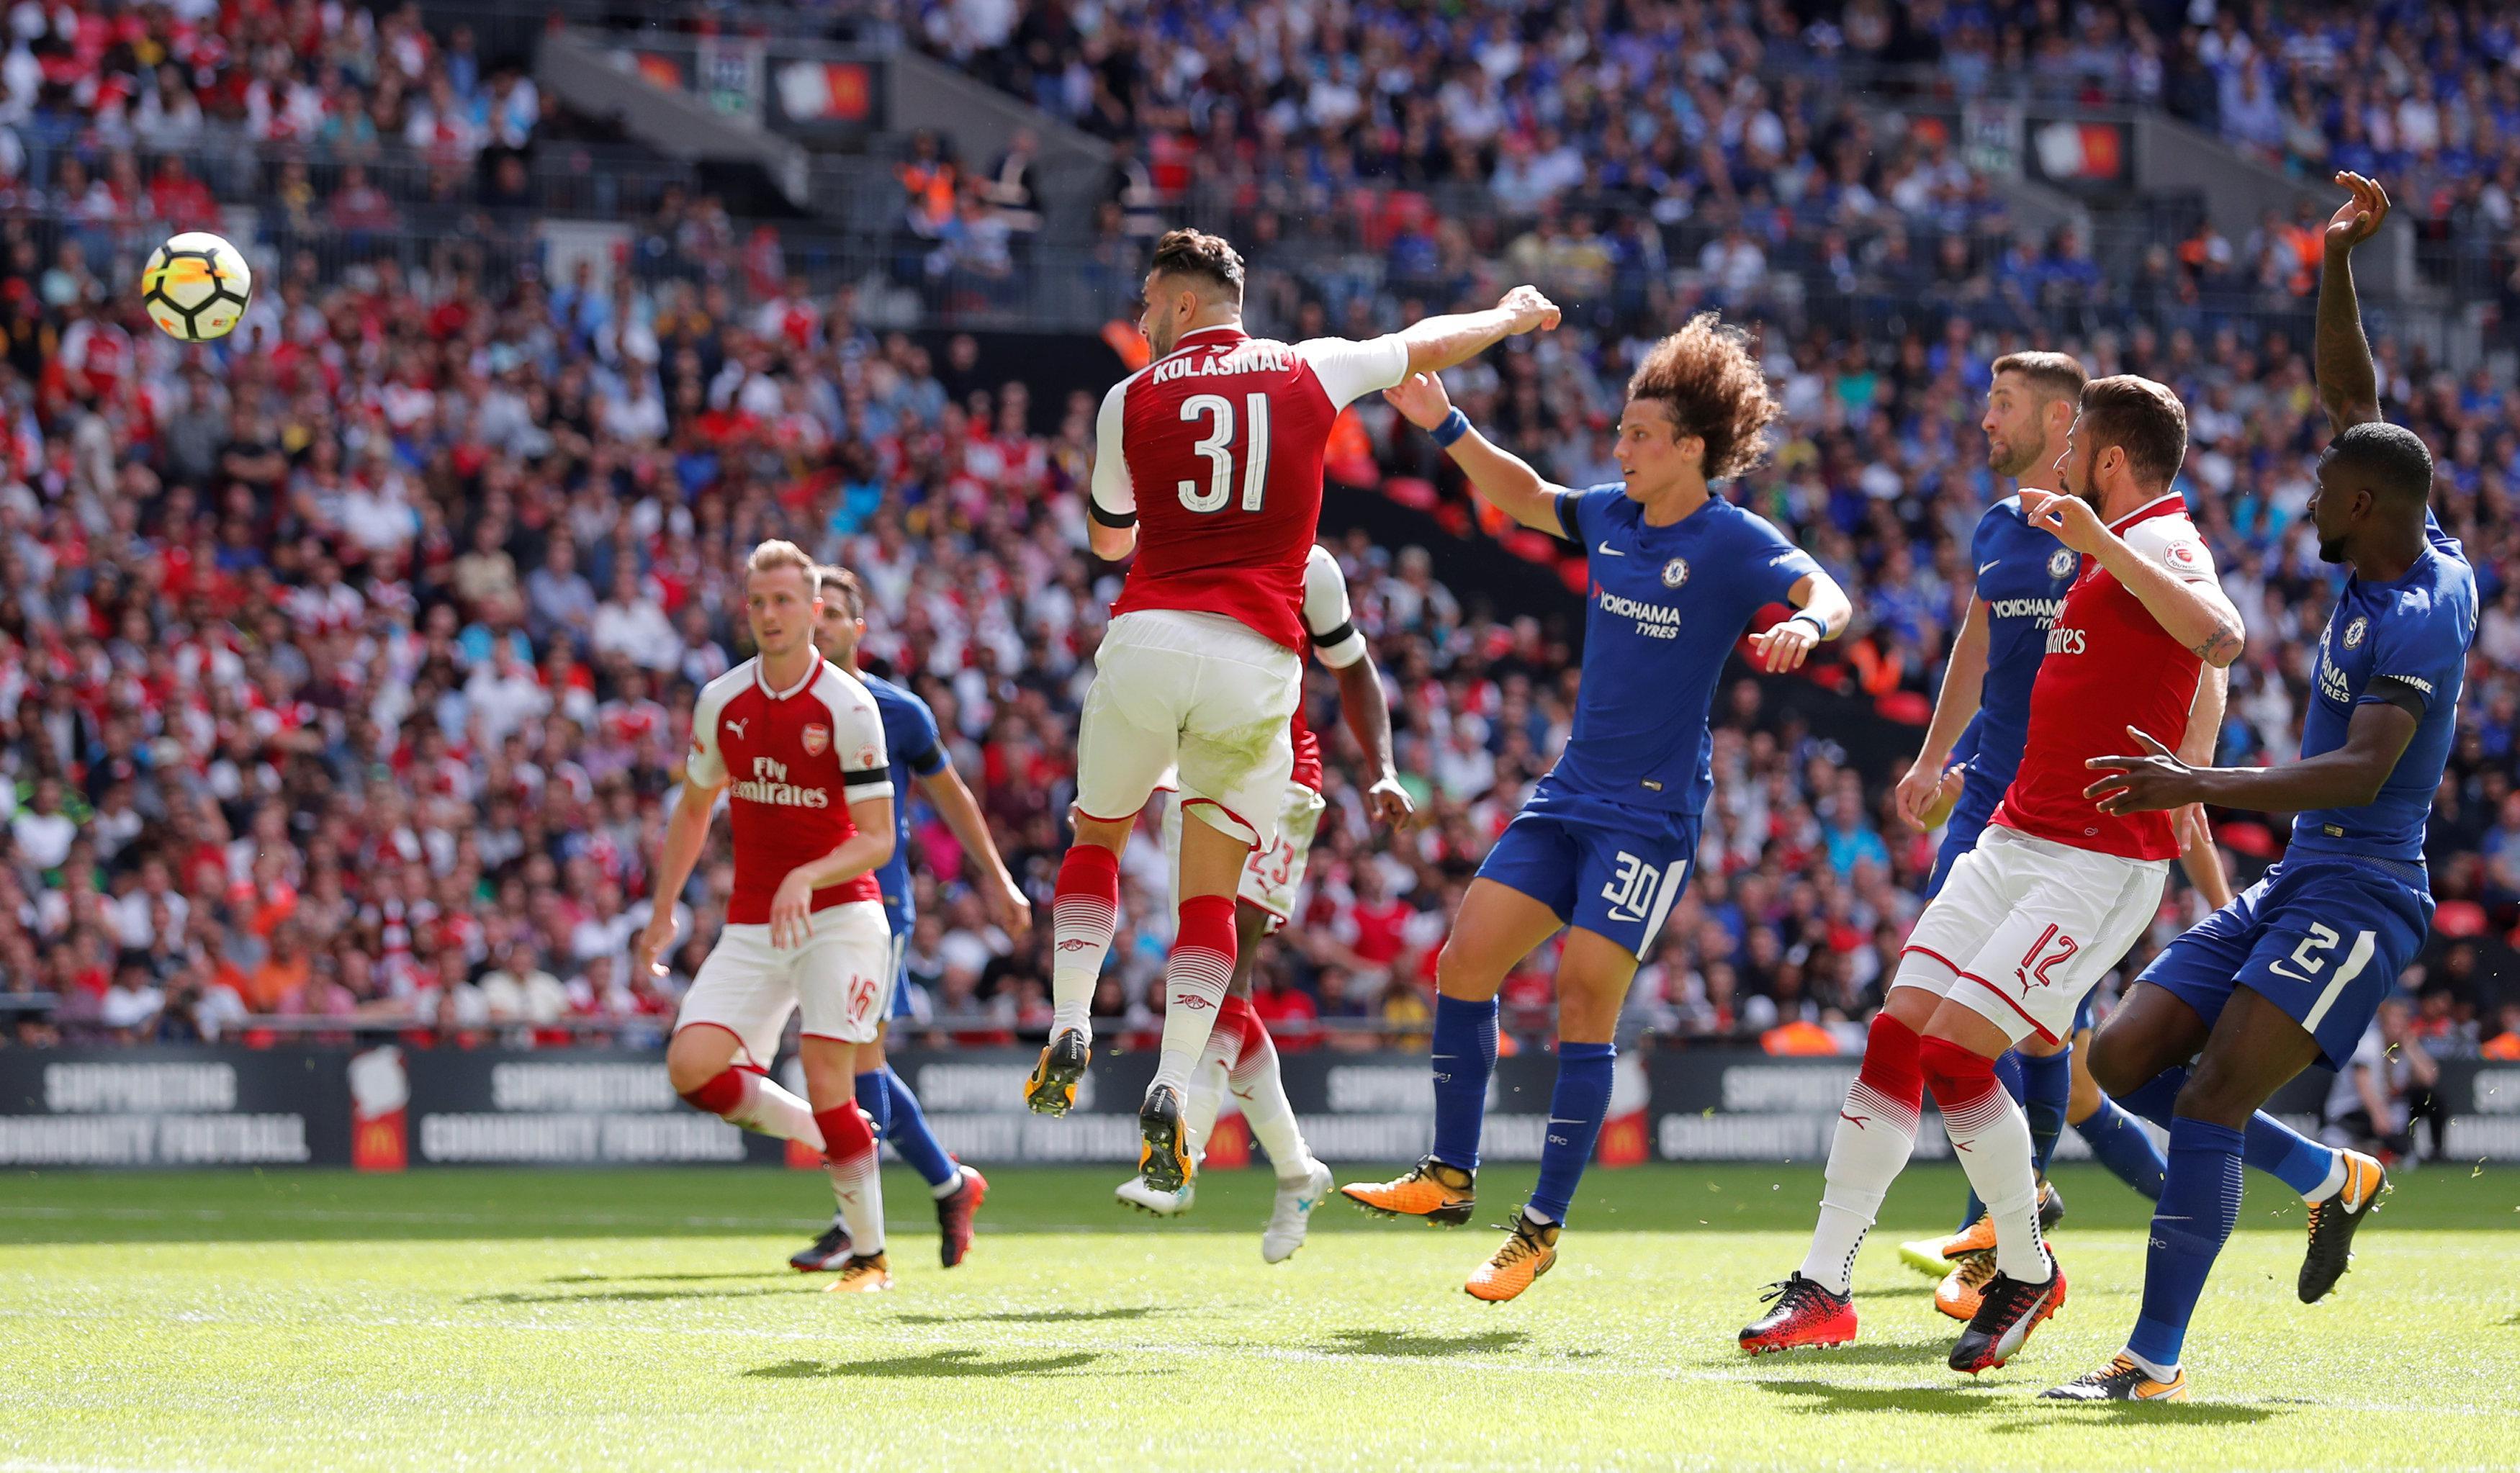 Kolasinac is the cult hero the Premier League deserves